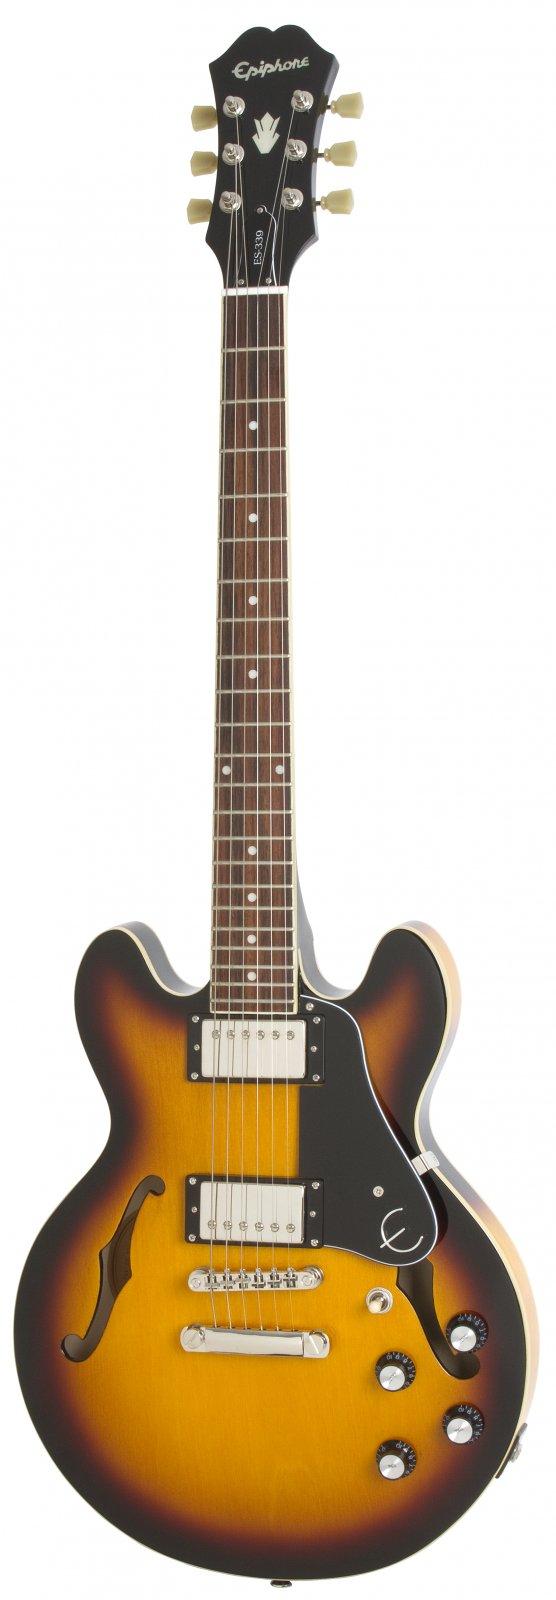 Epiphone ES-339 Pro Vintage Sunburst Electric Guitar ET39NANH